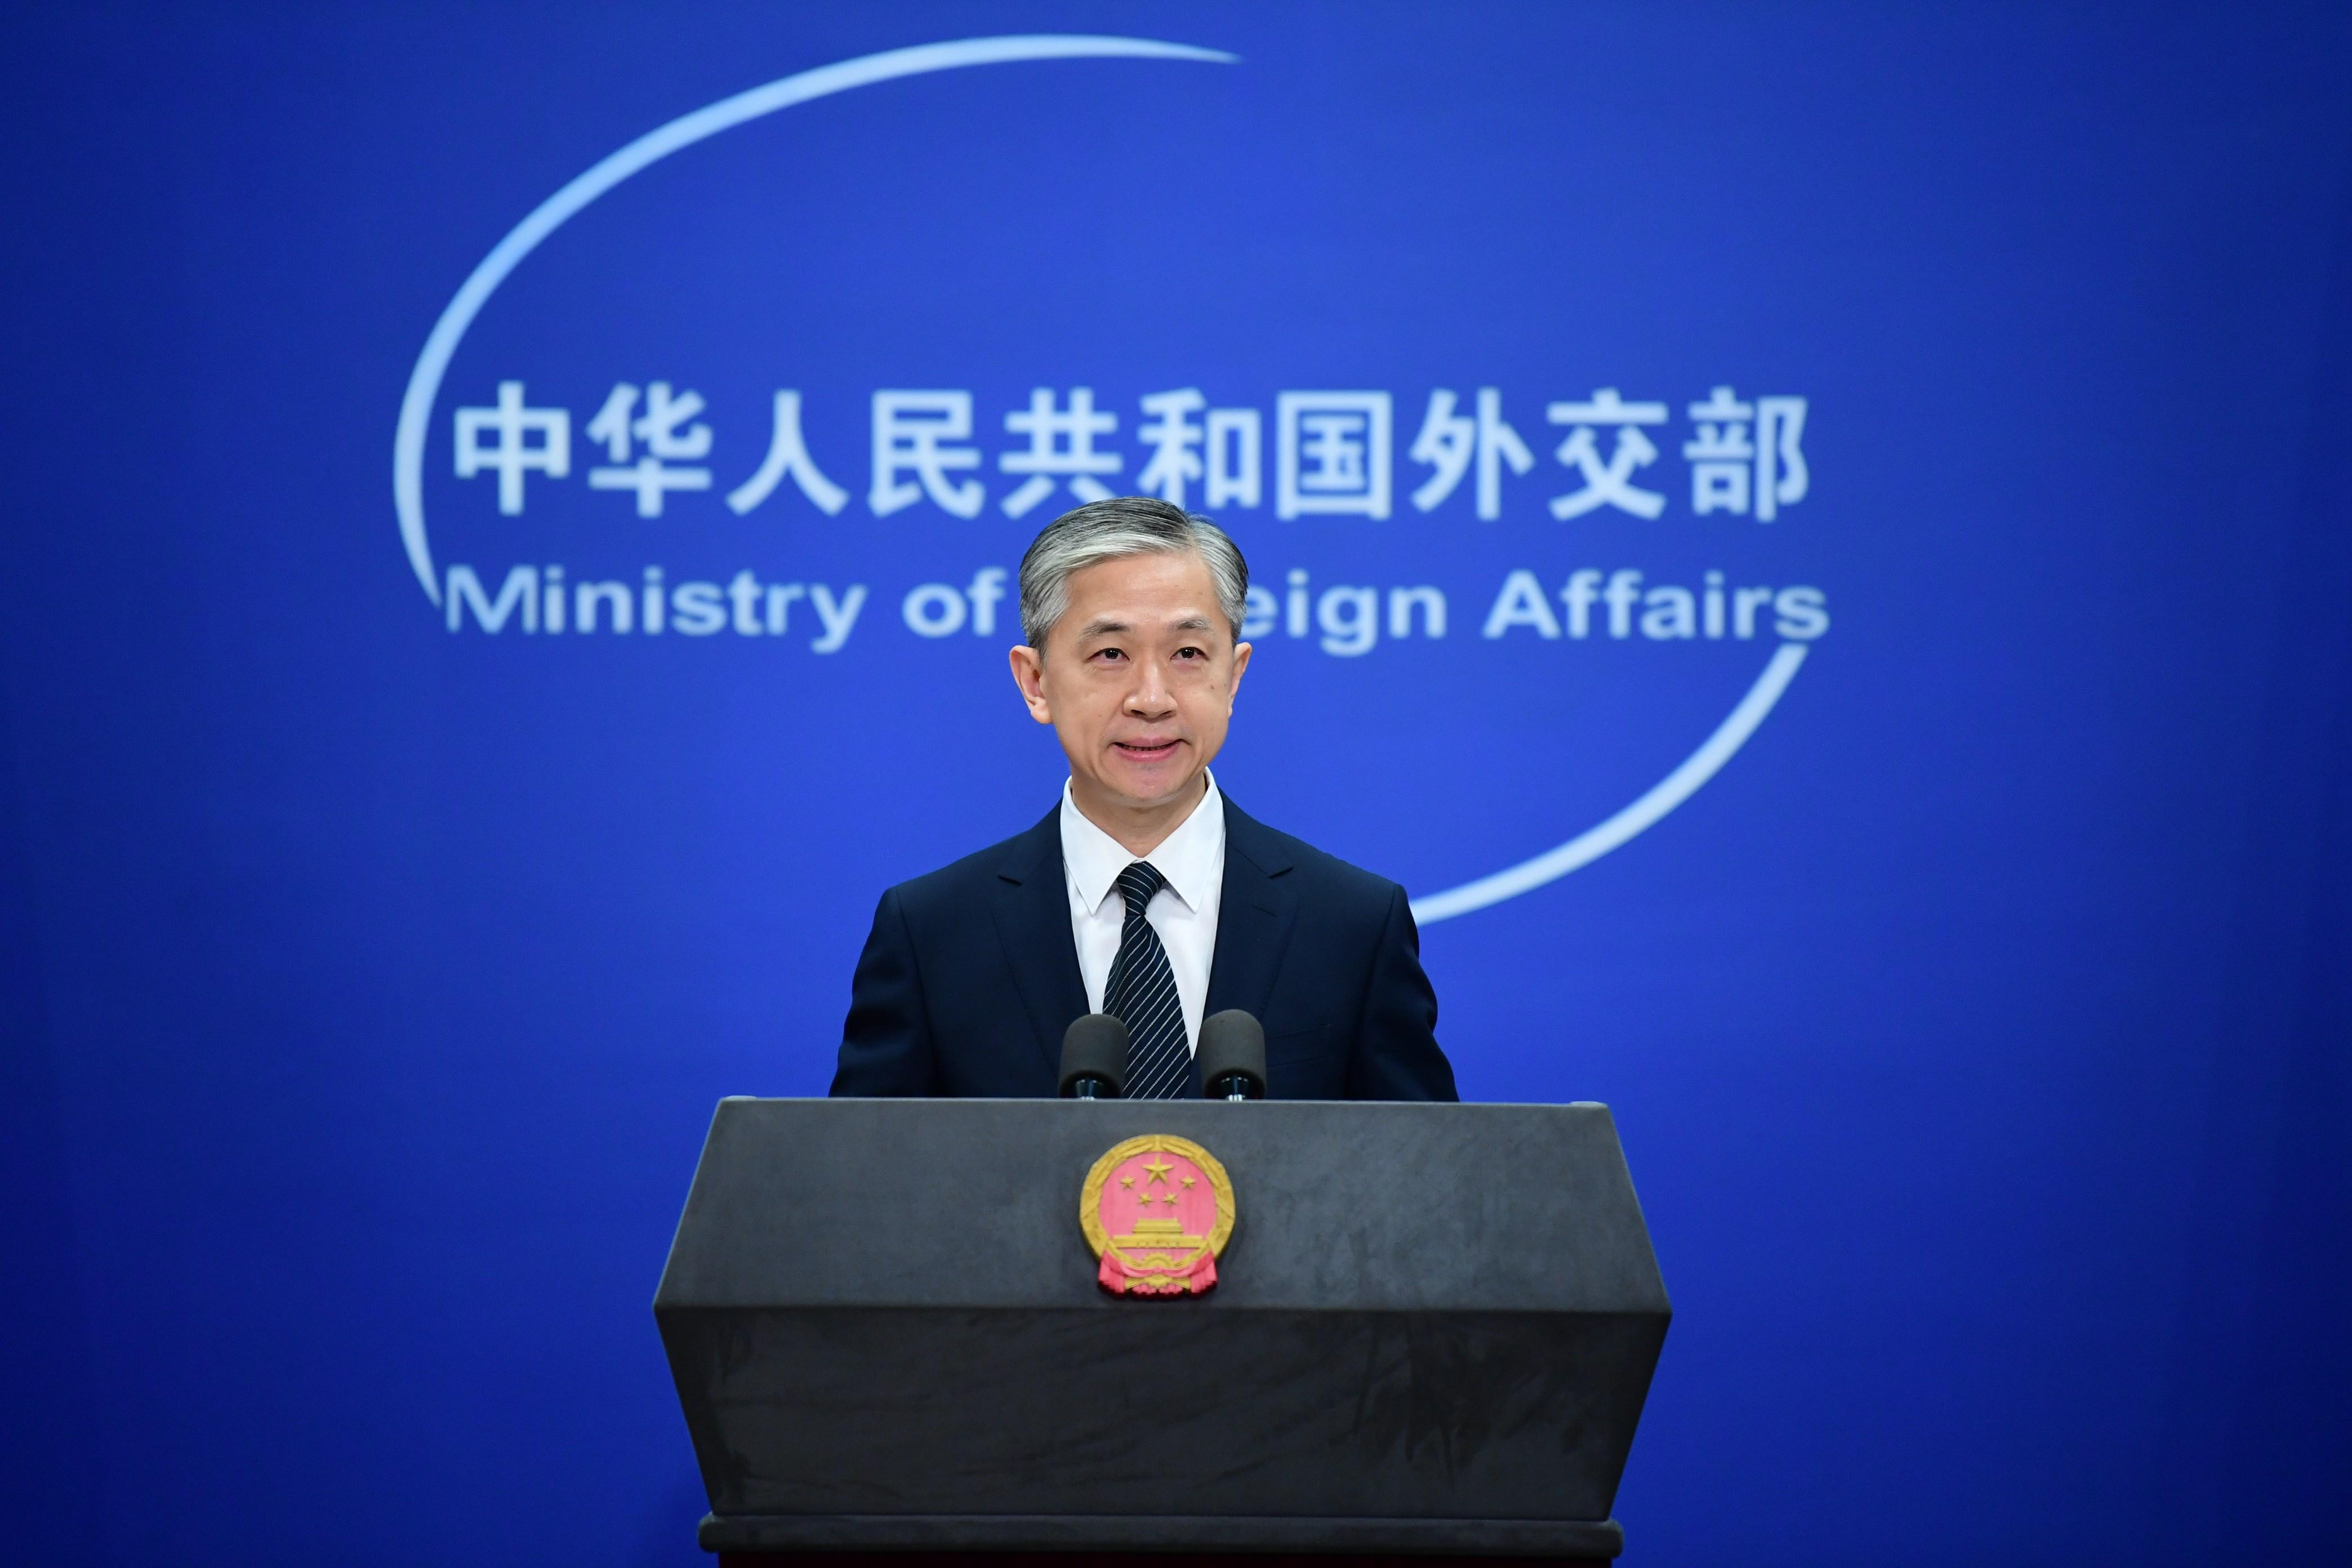 【google网站推广】_蓬佩奥指责港警通缉6名乱港分子,外交部回应